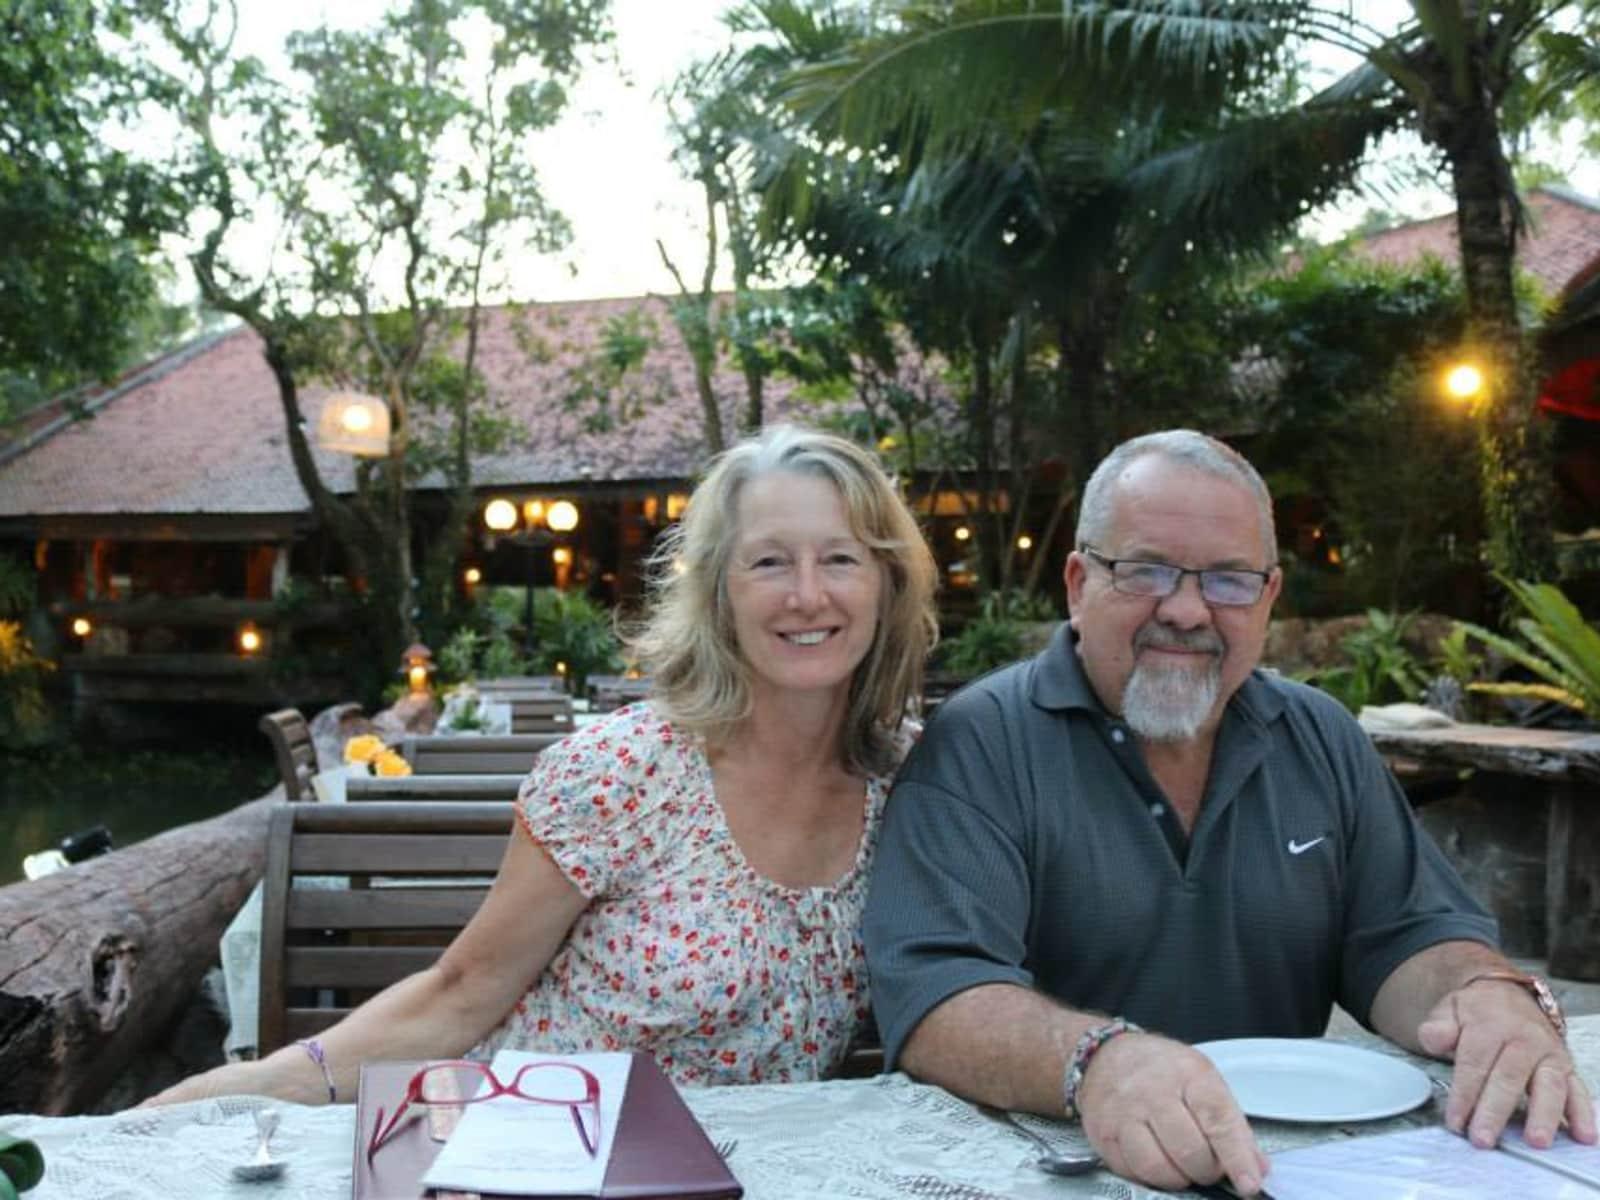 Mary & Ron from Bundaberg, Queensland, Australia